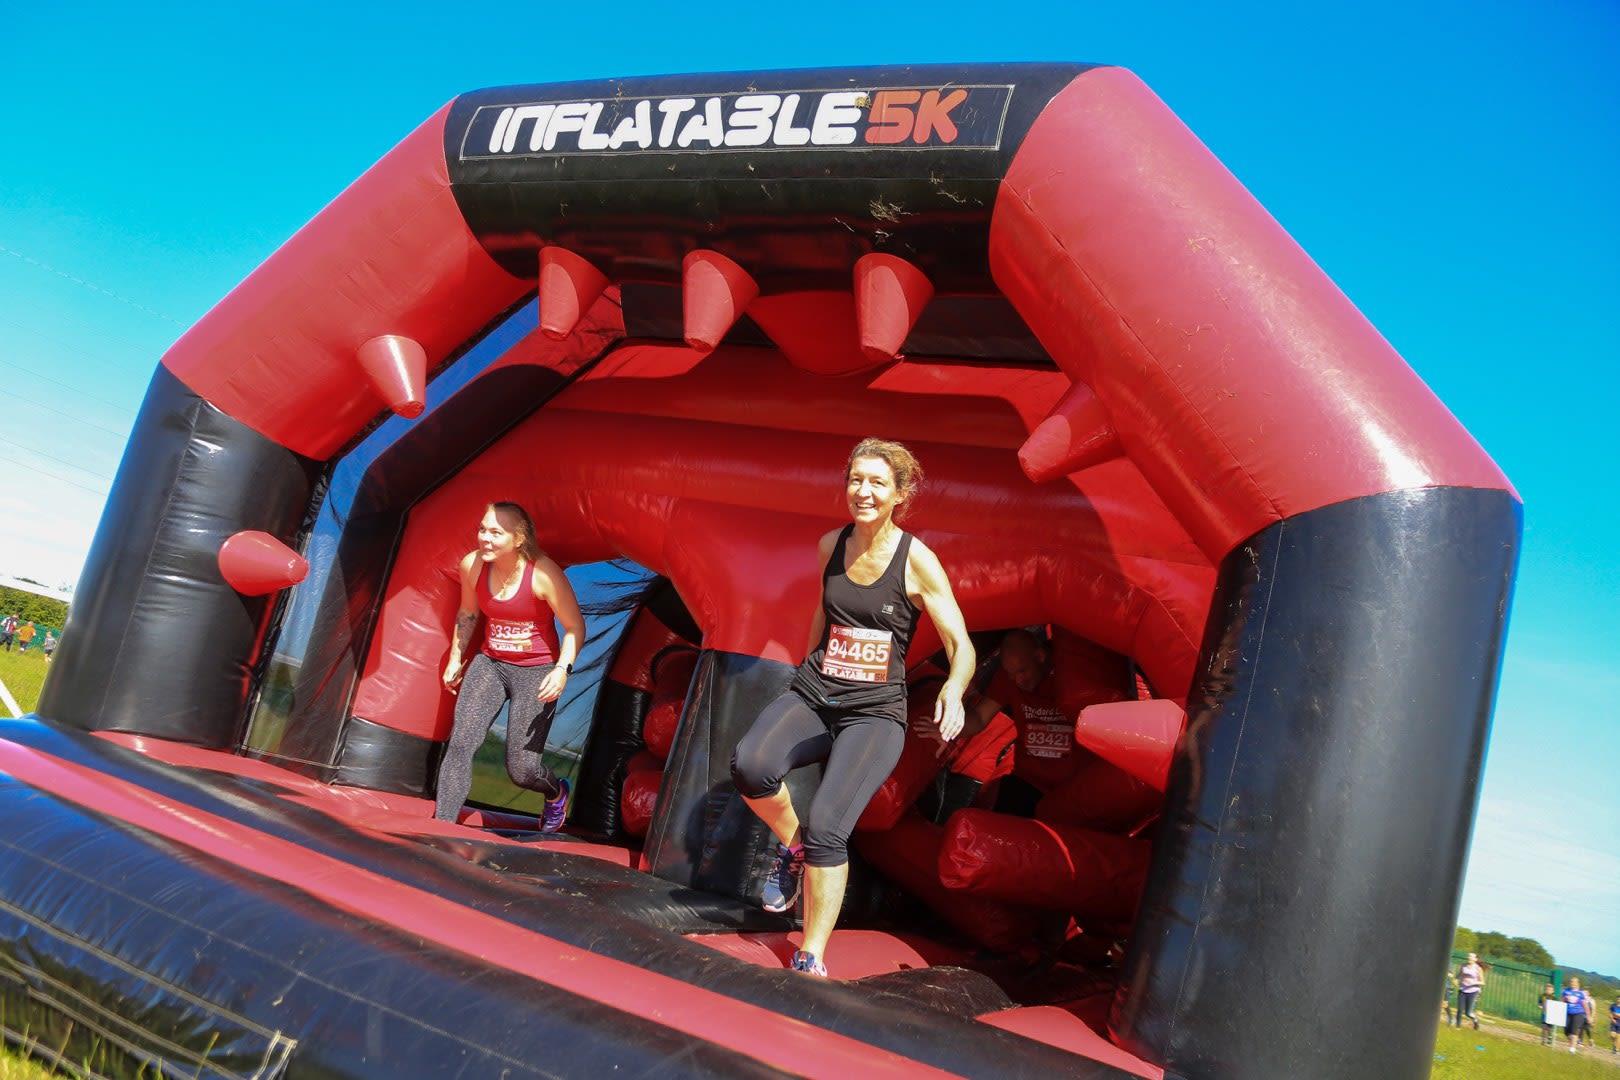 Inflatable 5k - Glasgow